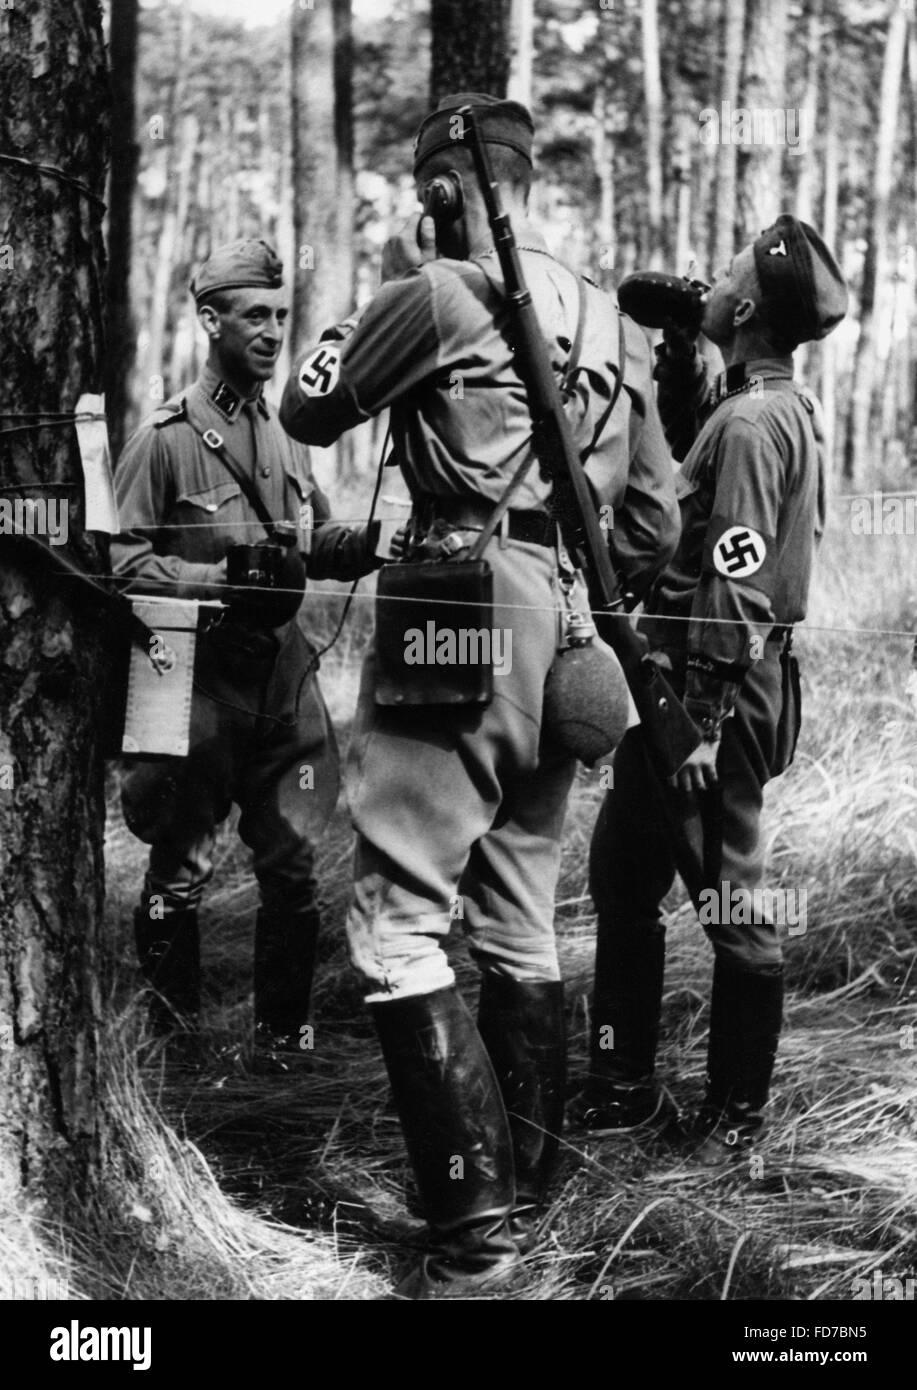 Field exercise of the Nachrichten SA, 1939 - Stock Image